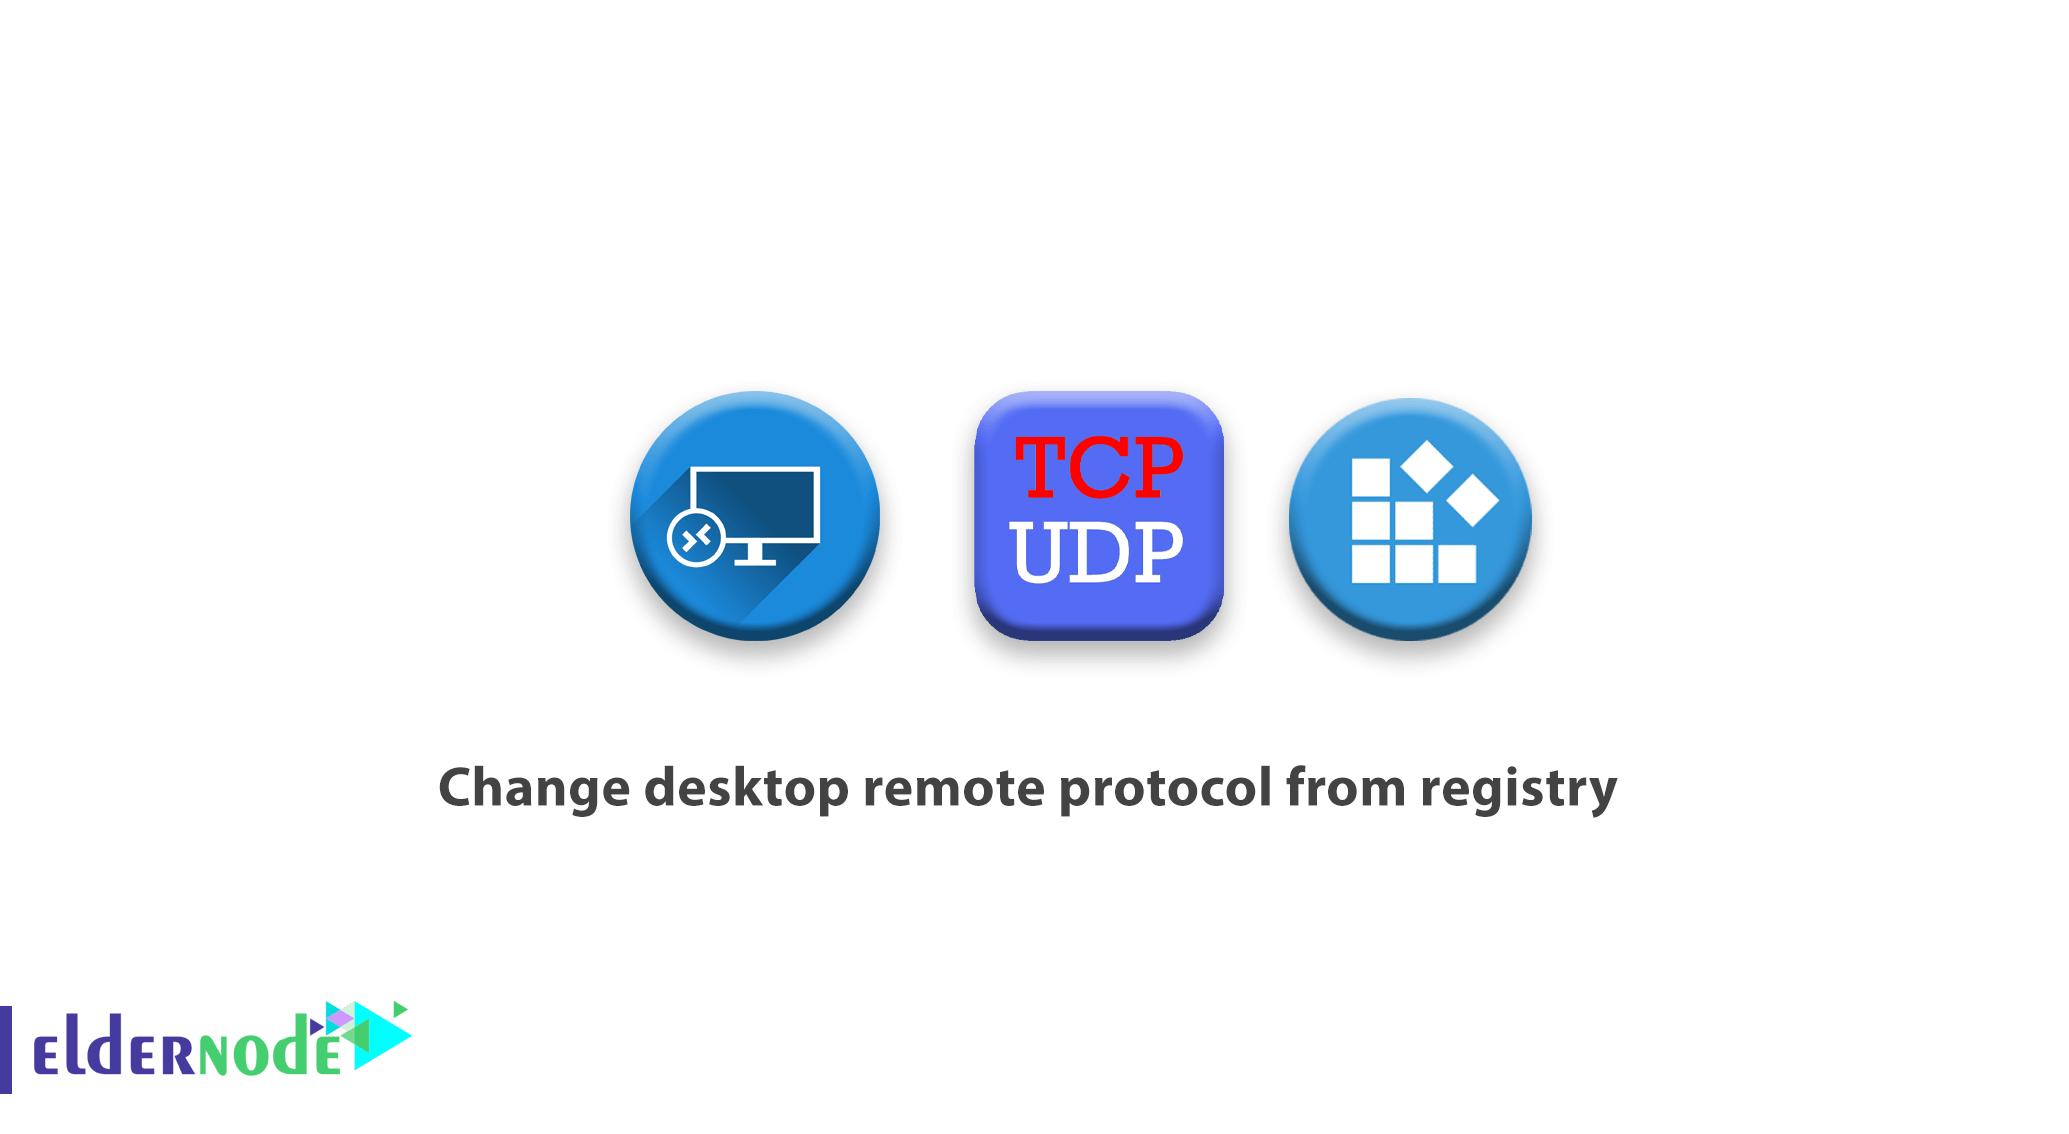 Change desktop remote protocol from registry